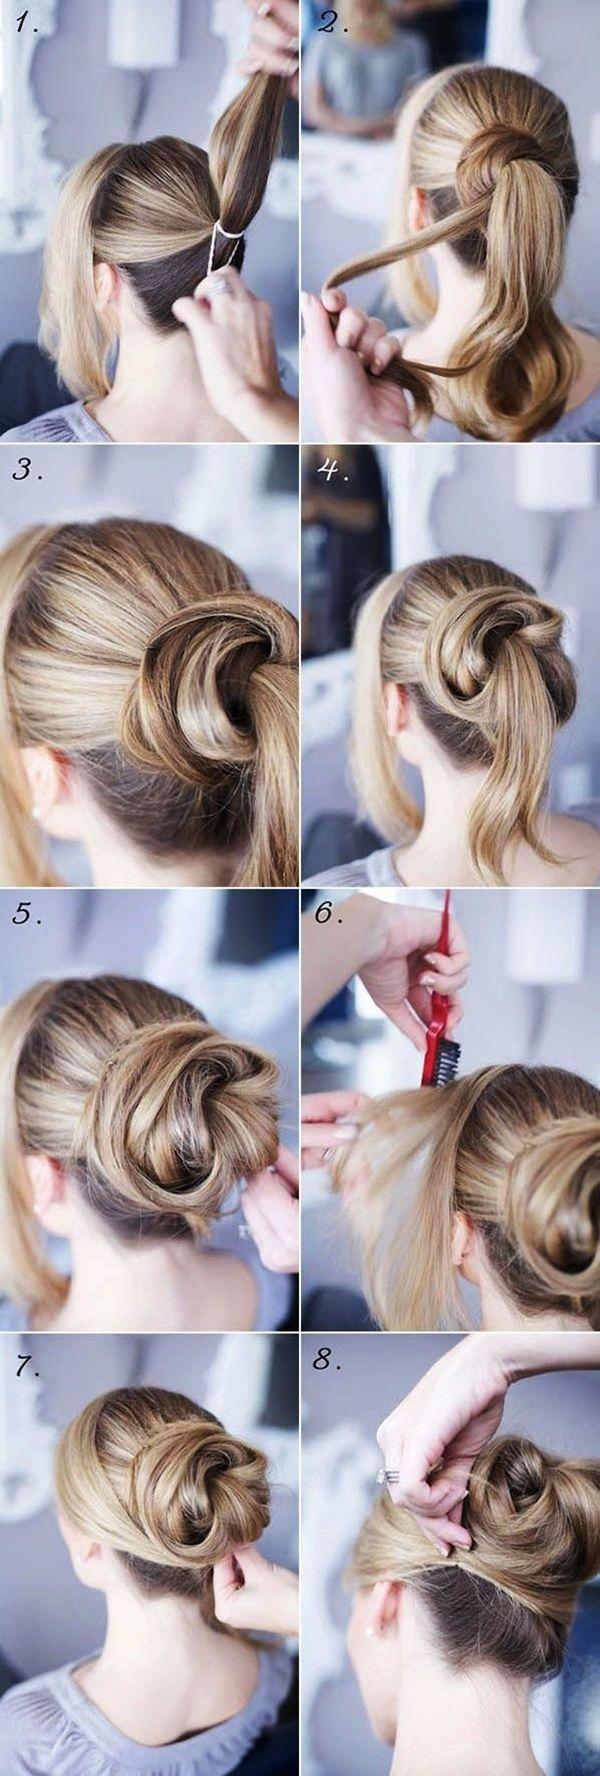 15 Easy Step By Step Hairstyles For Long Hair Hair Hair